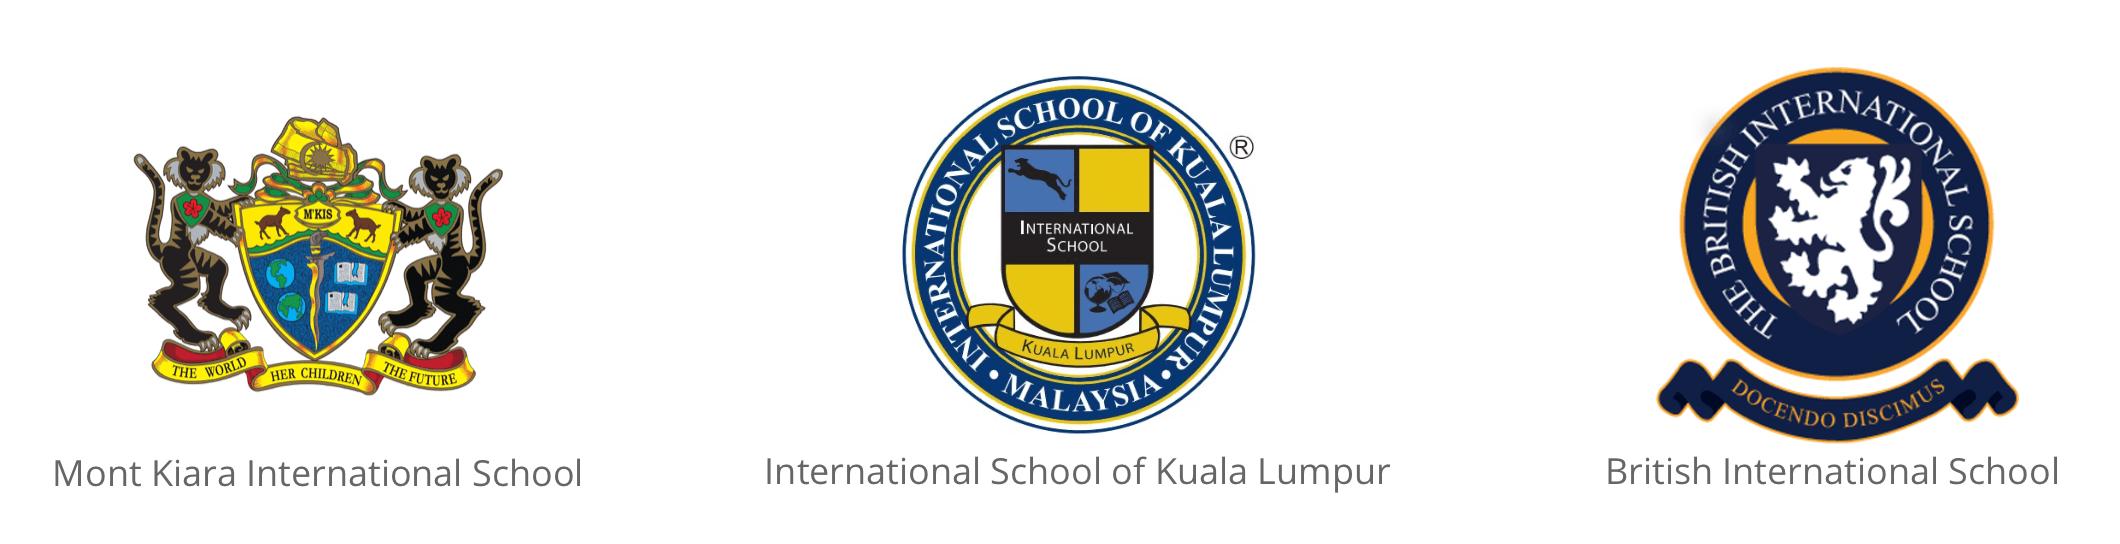 International schools  logos from Mont Kiara International School, International School of Kuala Lumpur and British International School